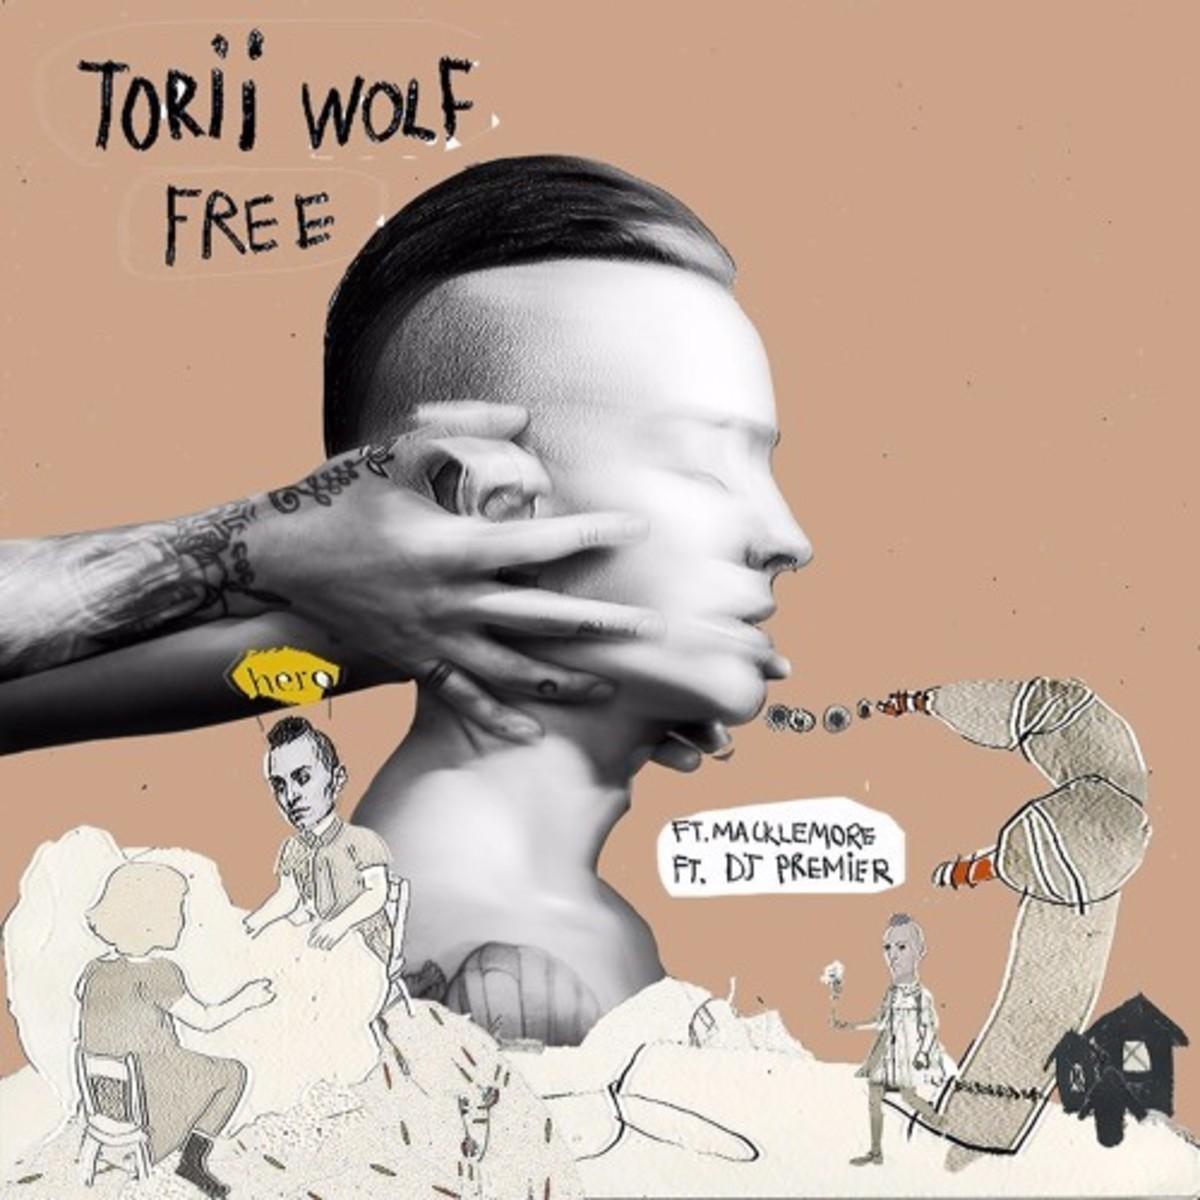 torii-wolf-free.jpg